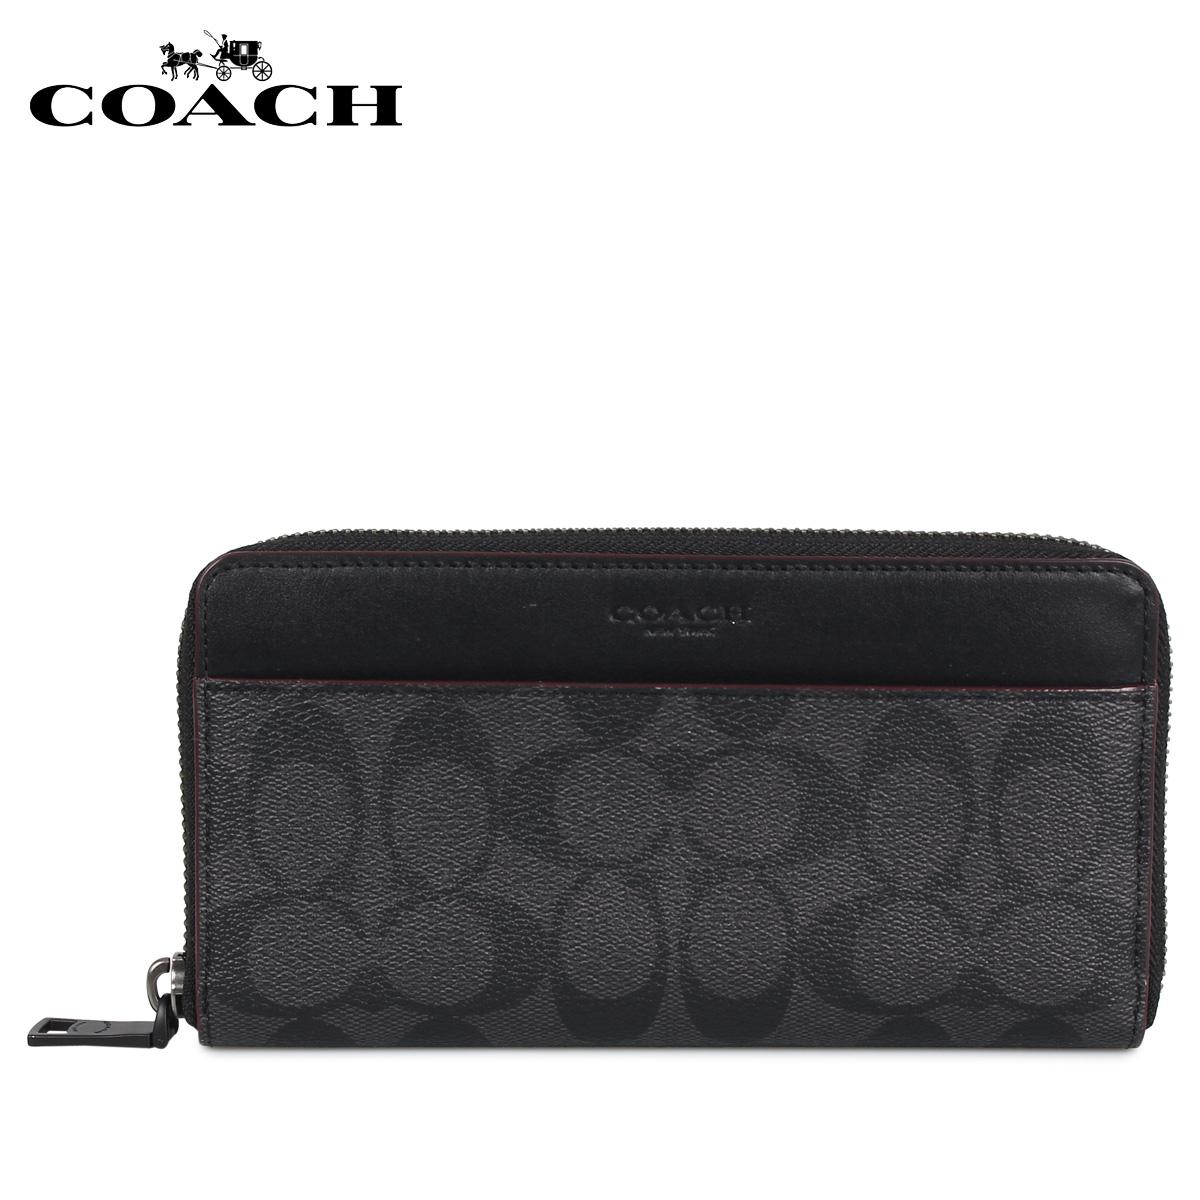 COACH F25517 コーチ 財布 長財布 メンズ ブラック 黒 [11/27 新入荷]